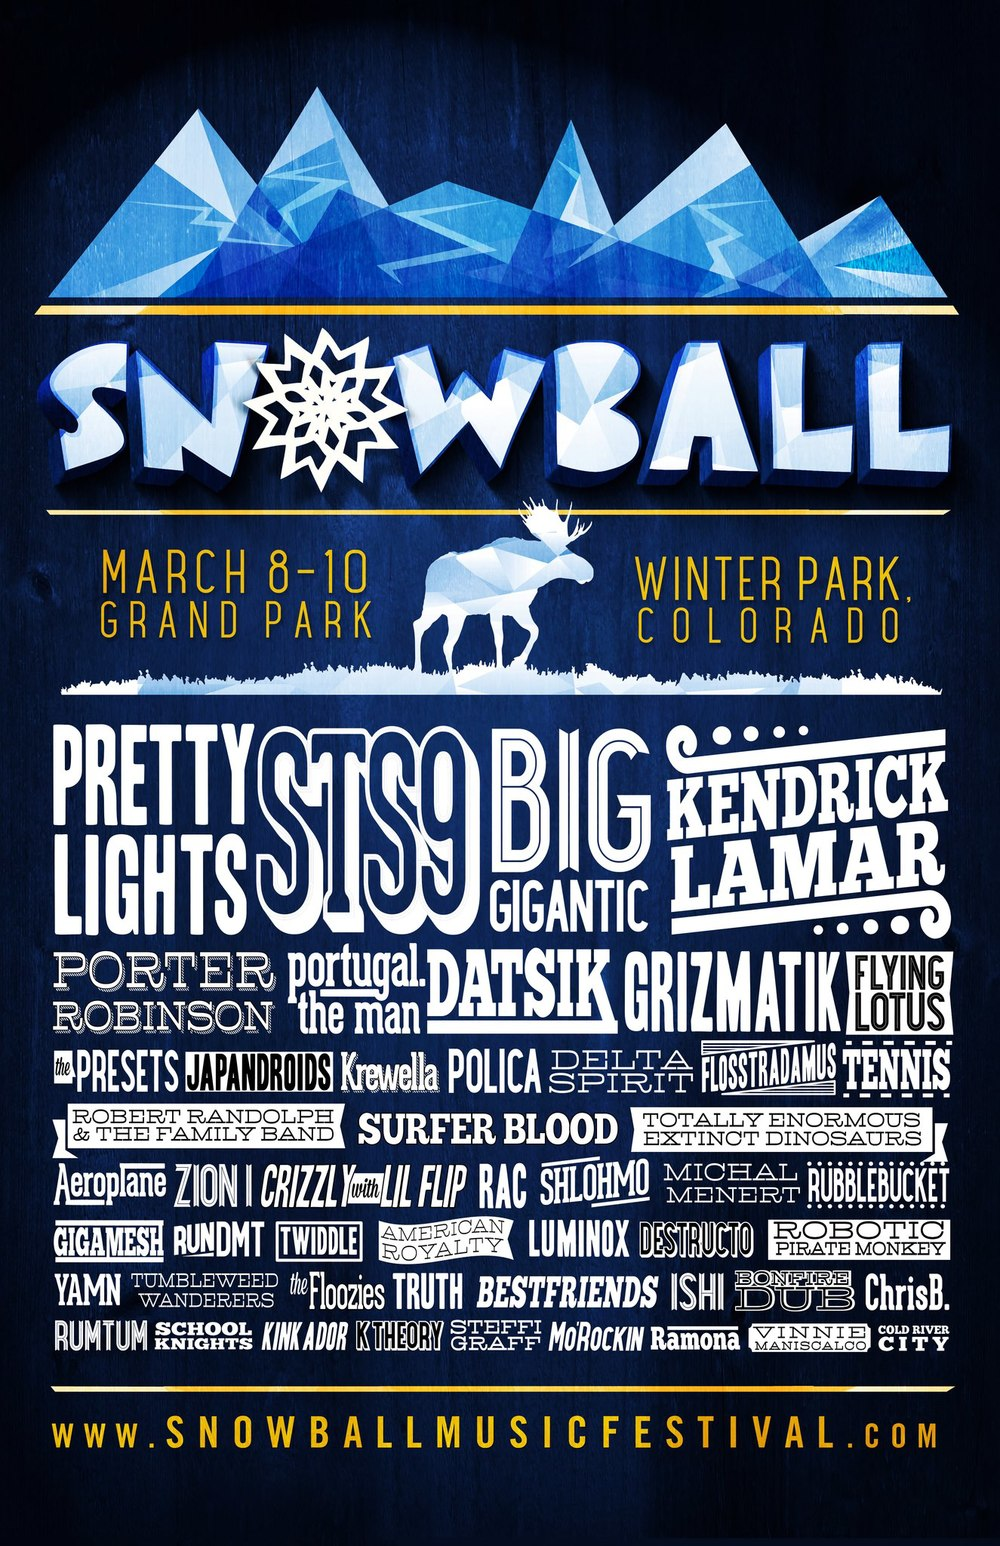 Snowball Music Festival 2013.jpg